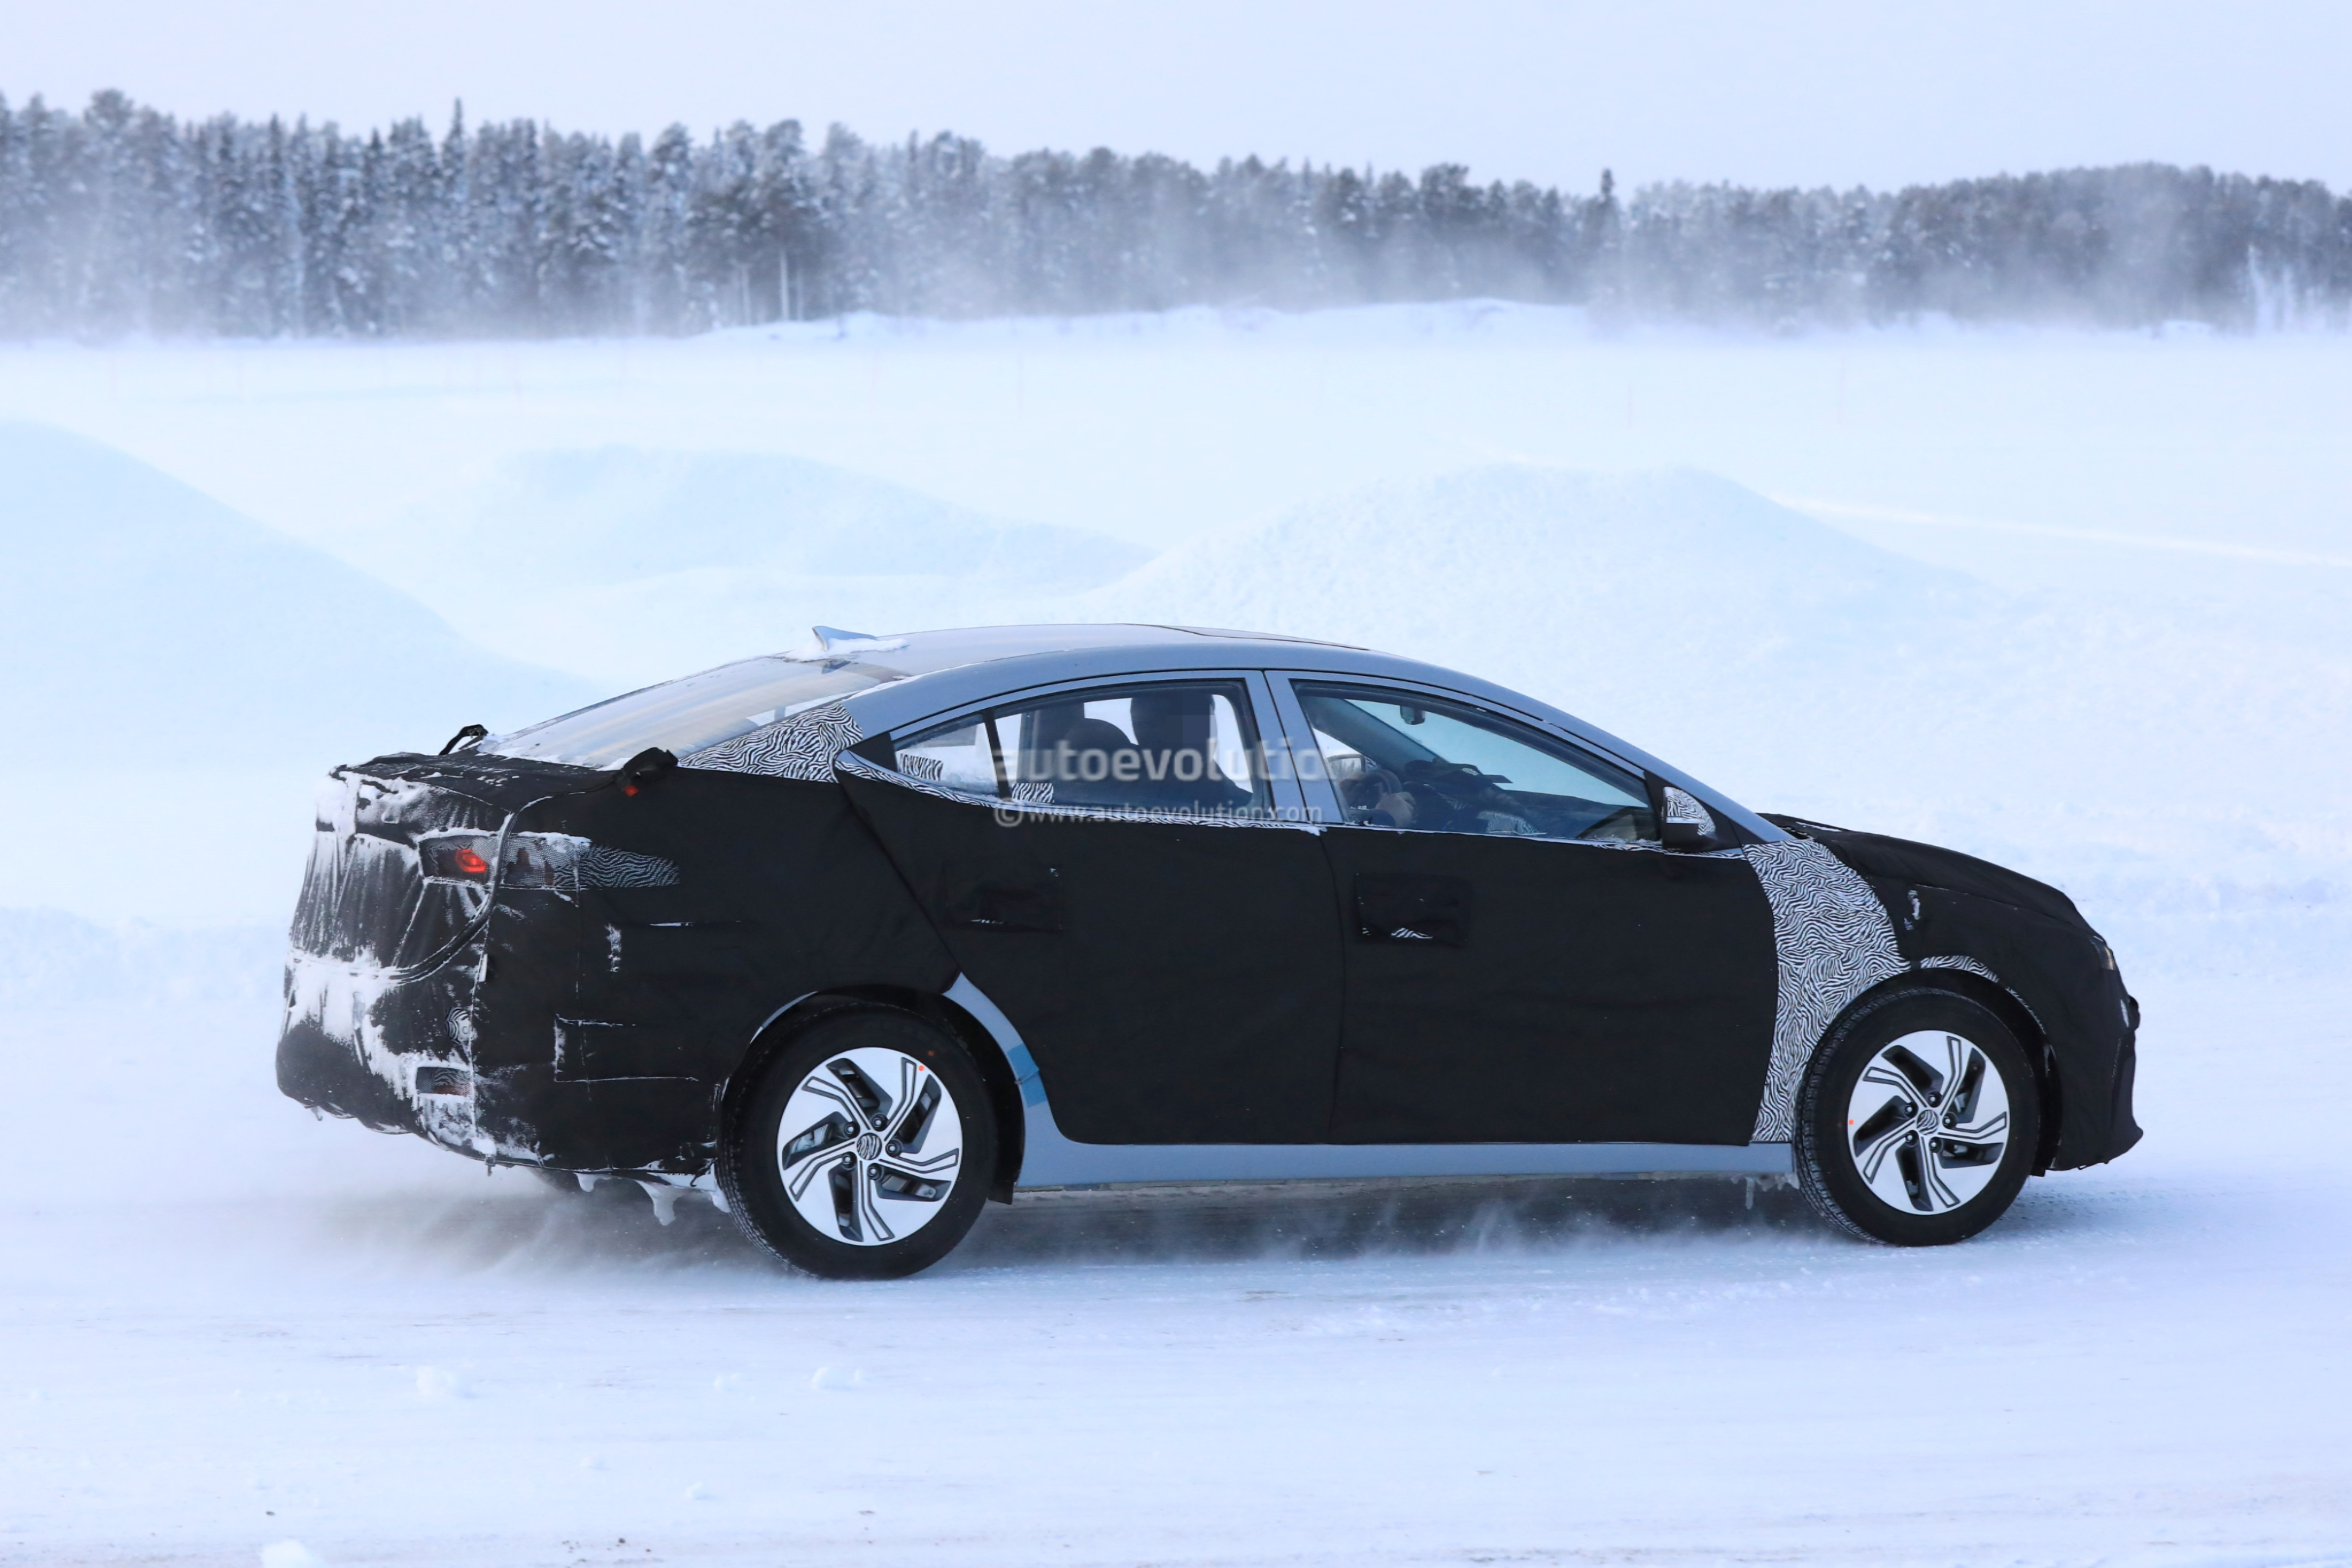 Spyshots: 2019 Hyundai Elantra Electric Does Cold-Weather ...